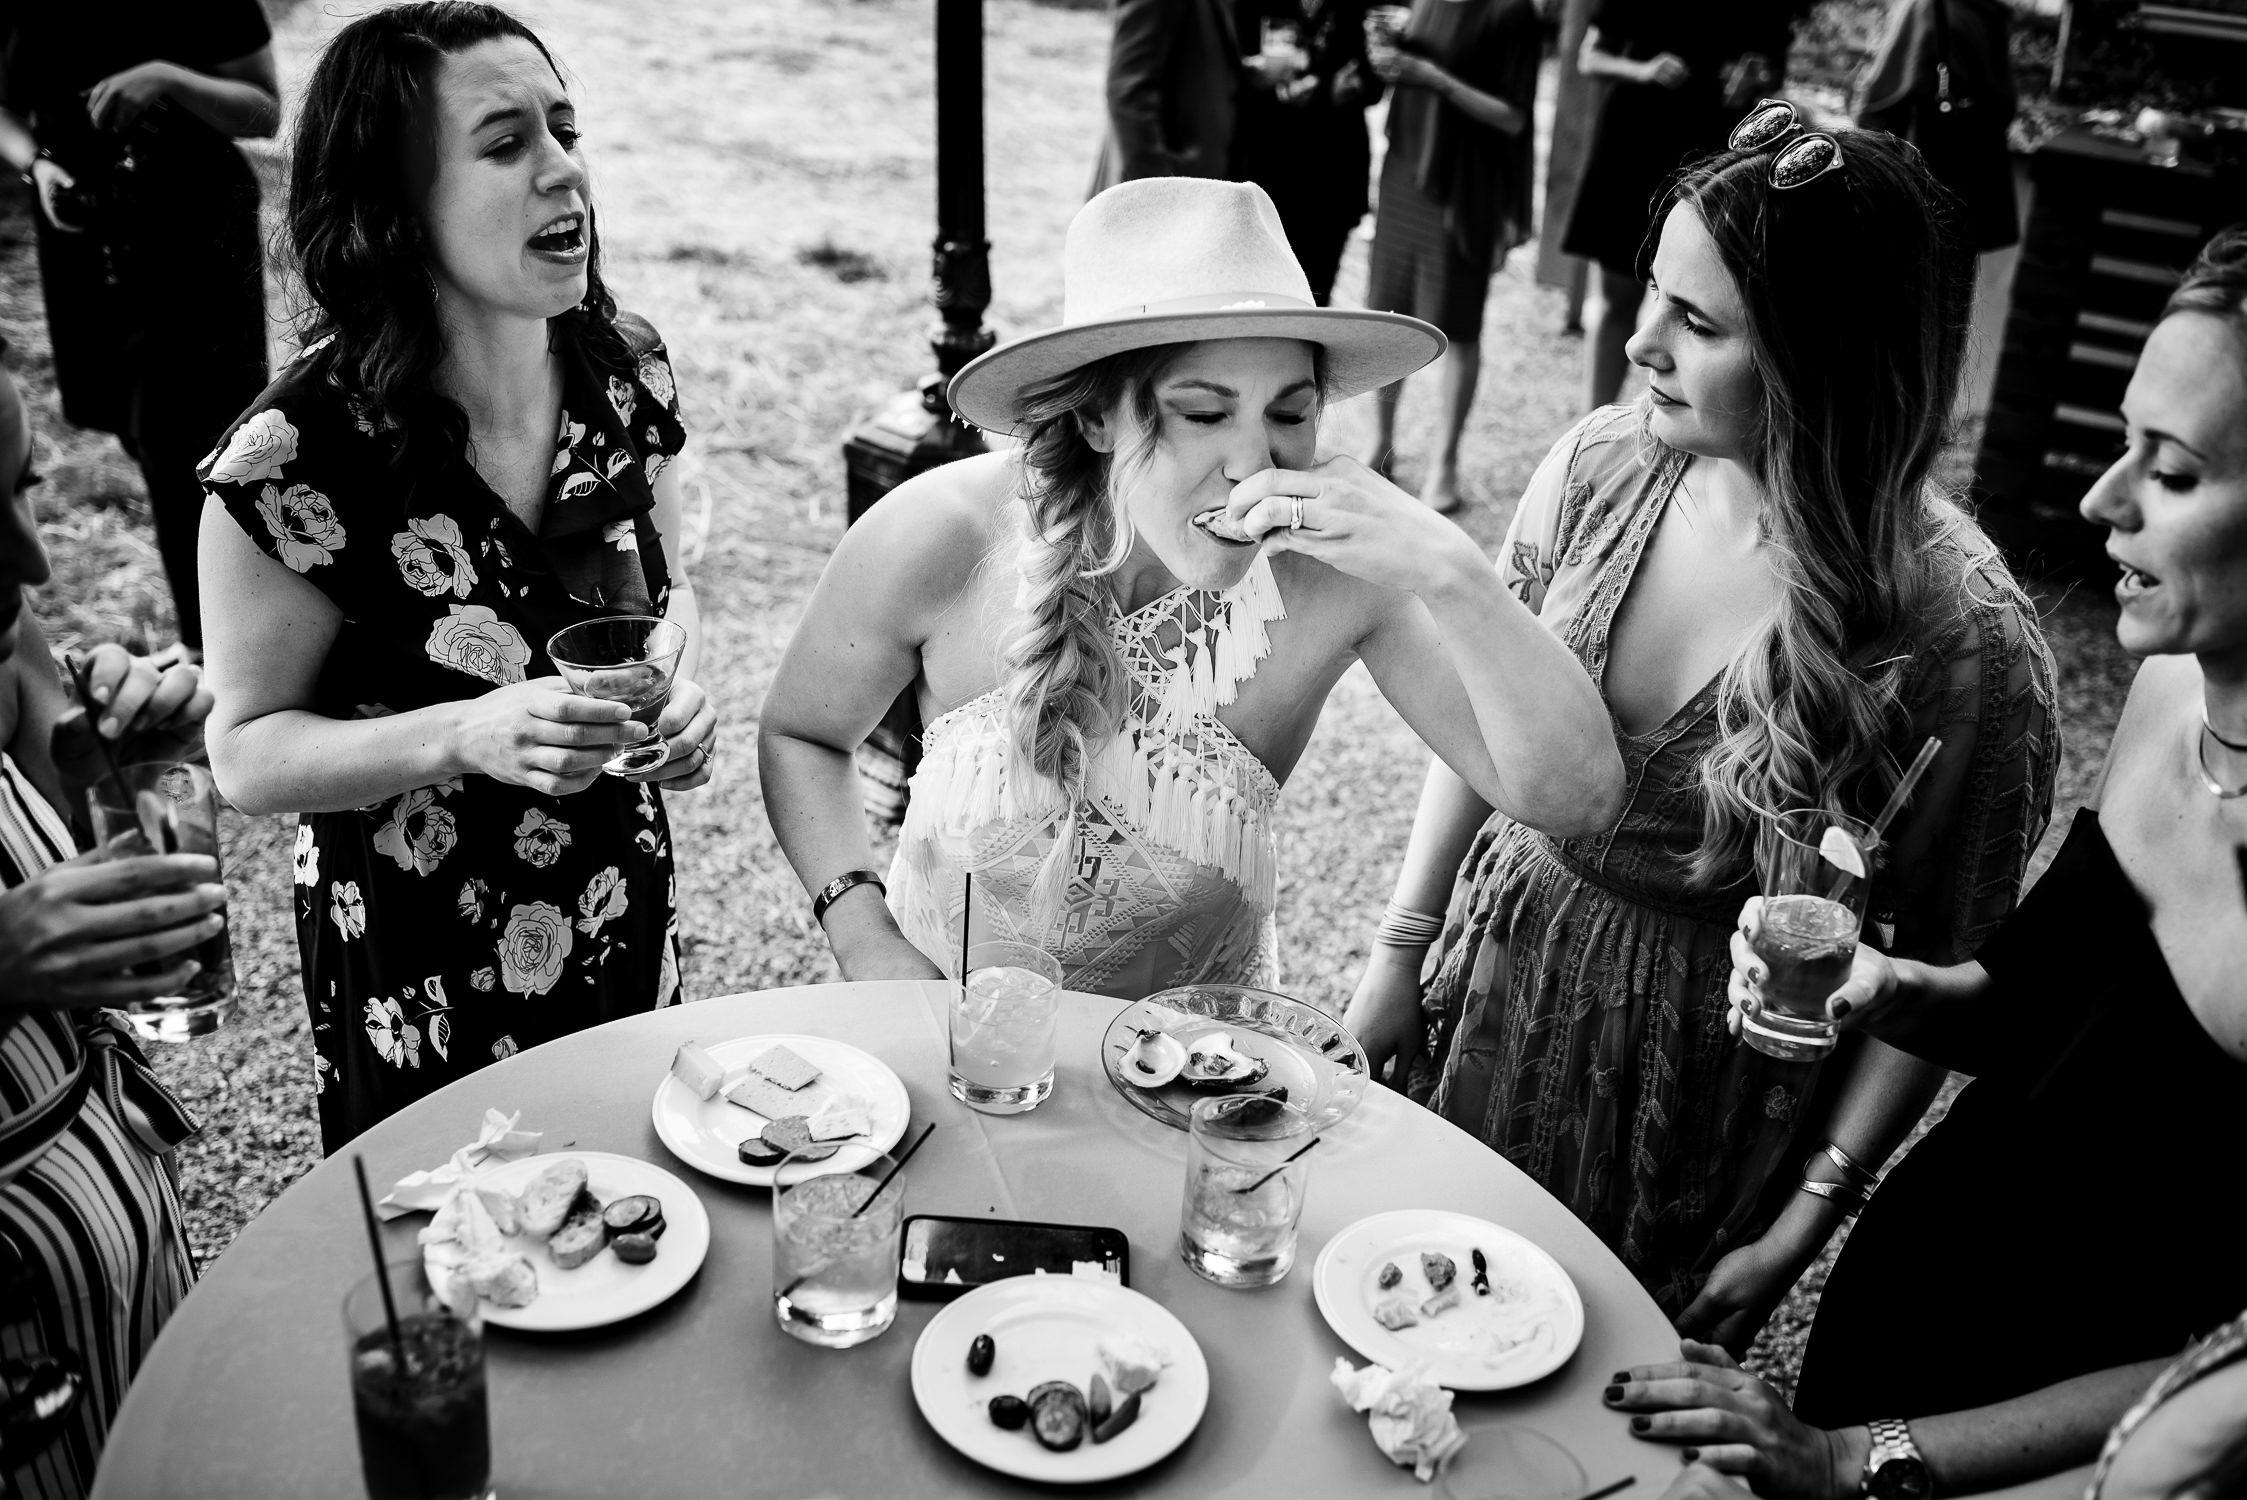 tourterelle-vermont-wedding-photographers-027-2-2247x1500.jpg